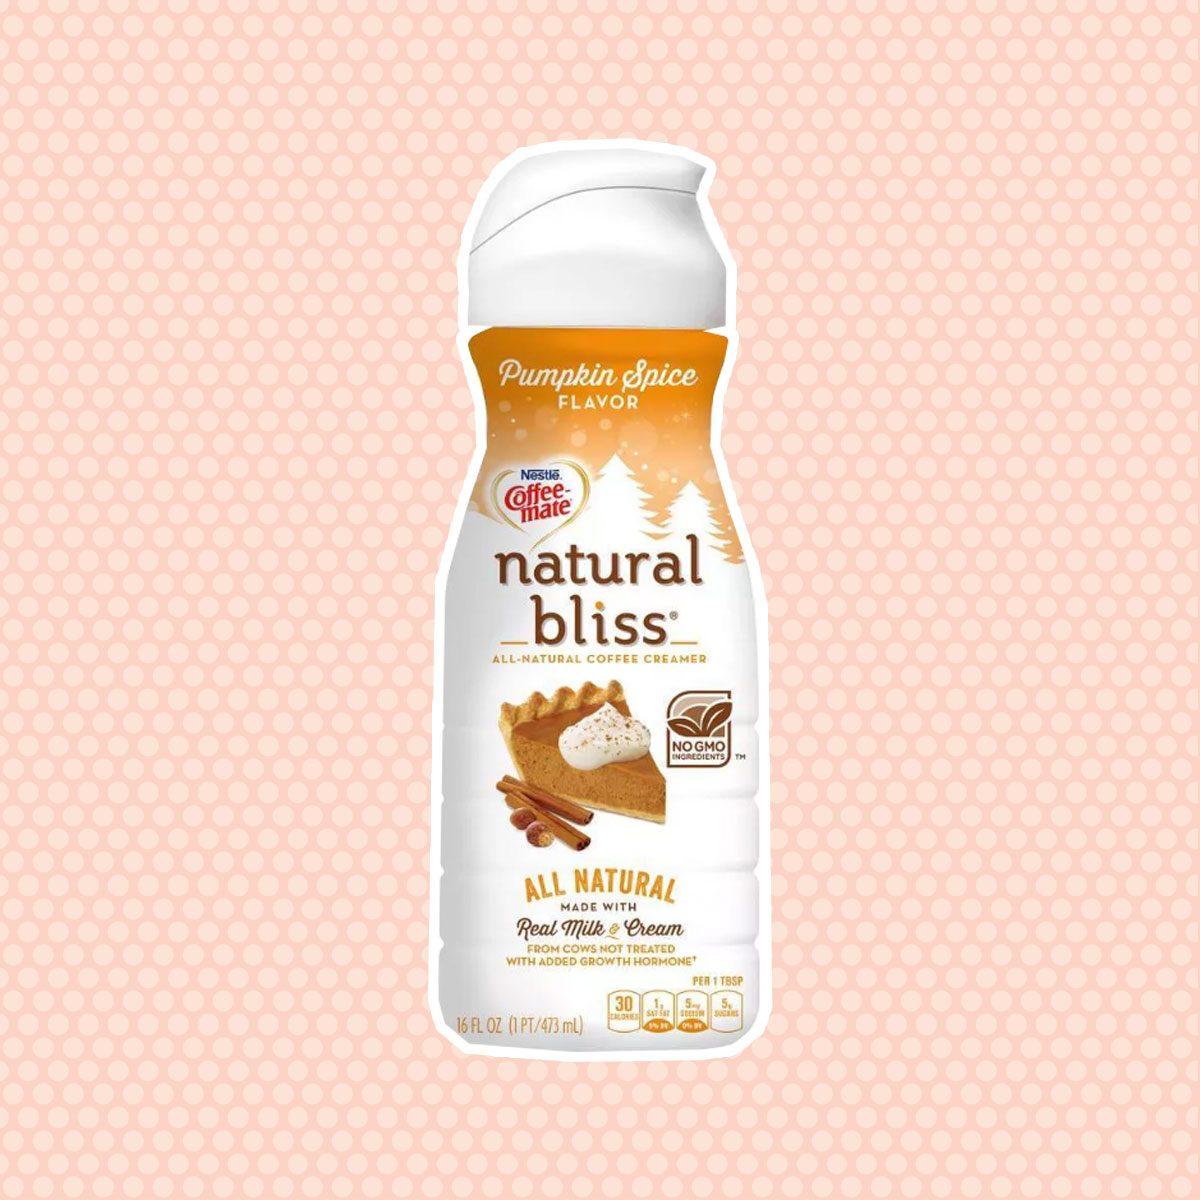 Natural Bliss Pumpkin Spice Coffee Creamer